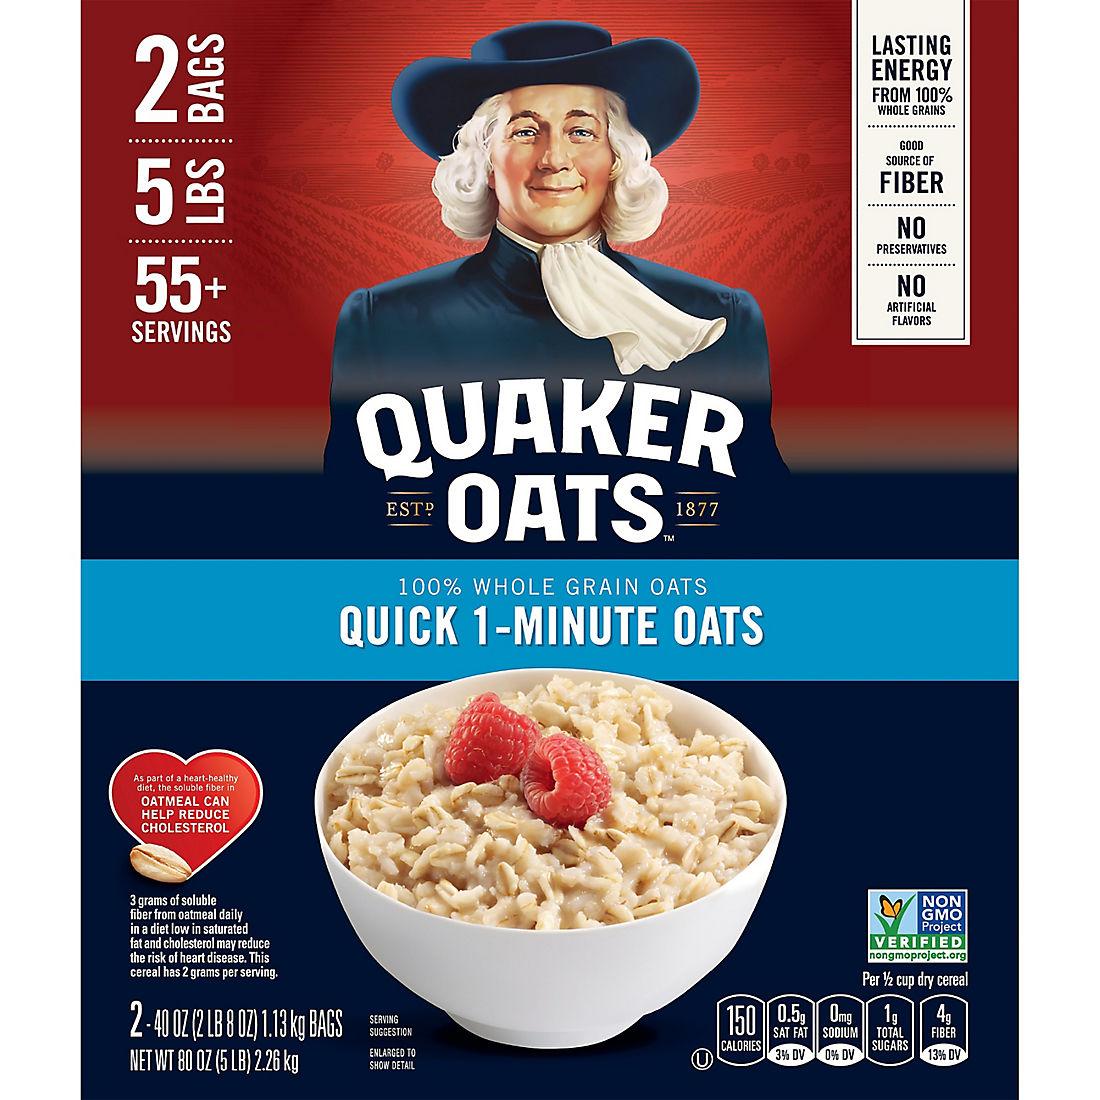 Quaker Oats 100% Natural Whole Grain